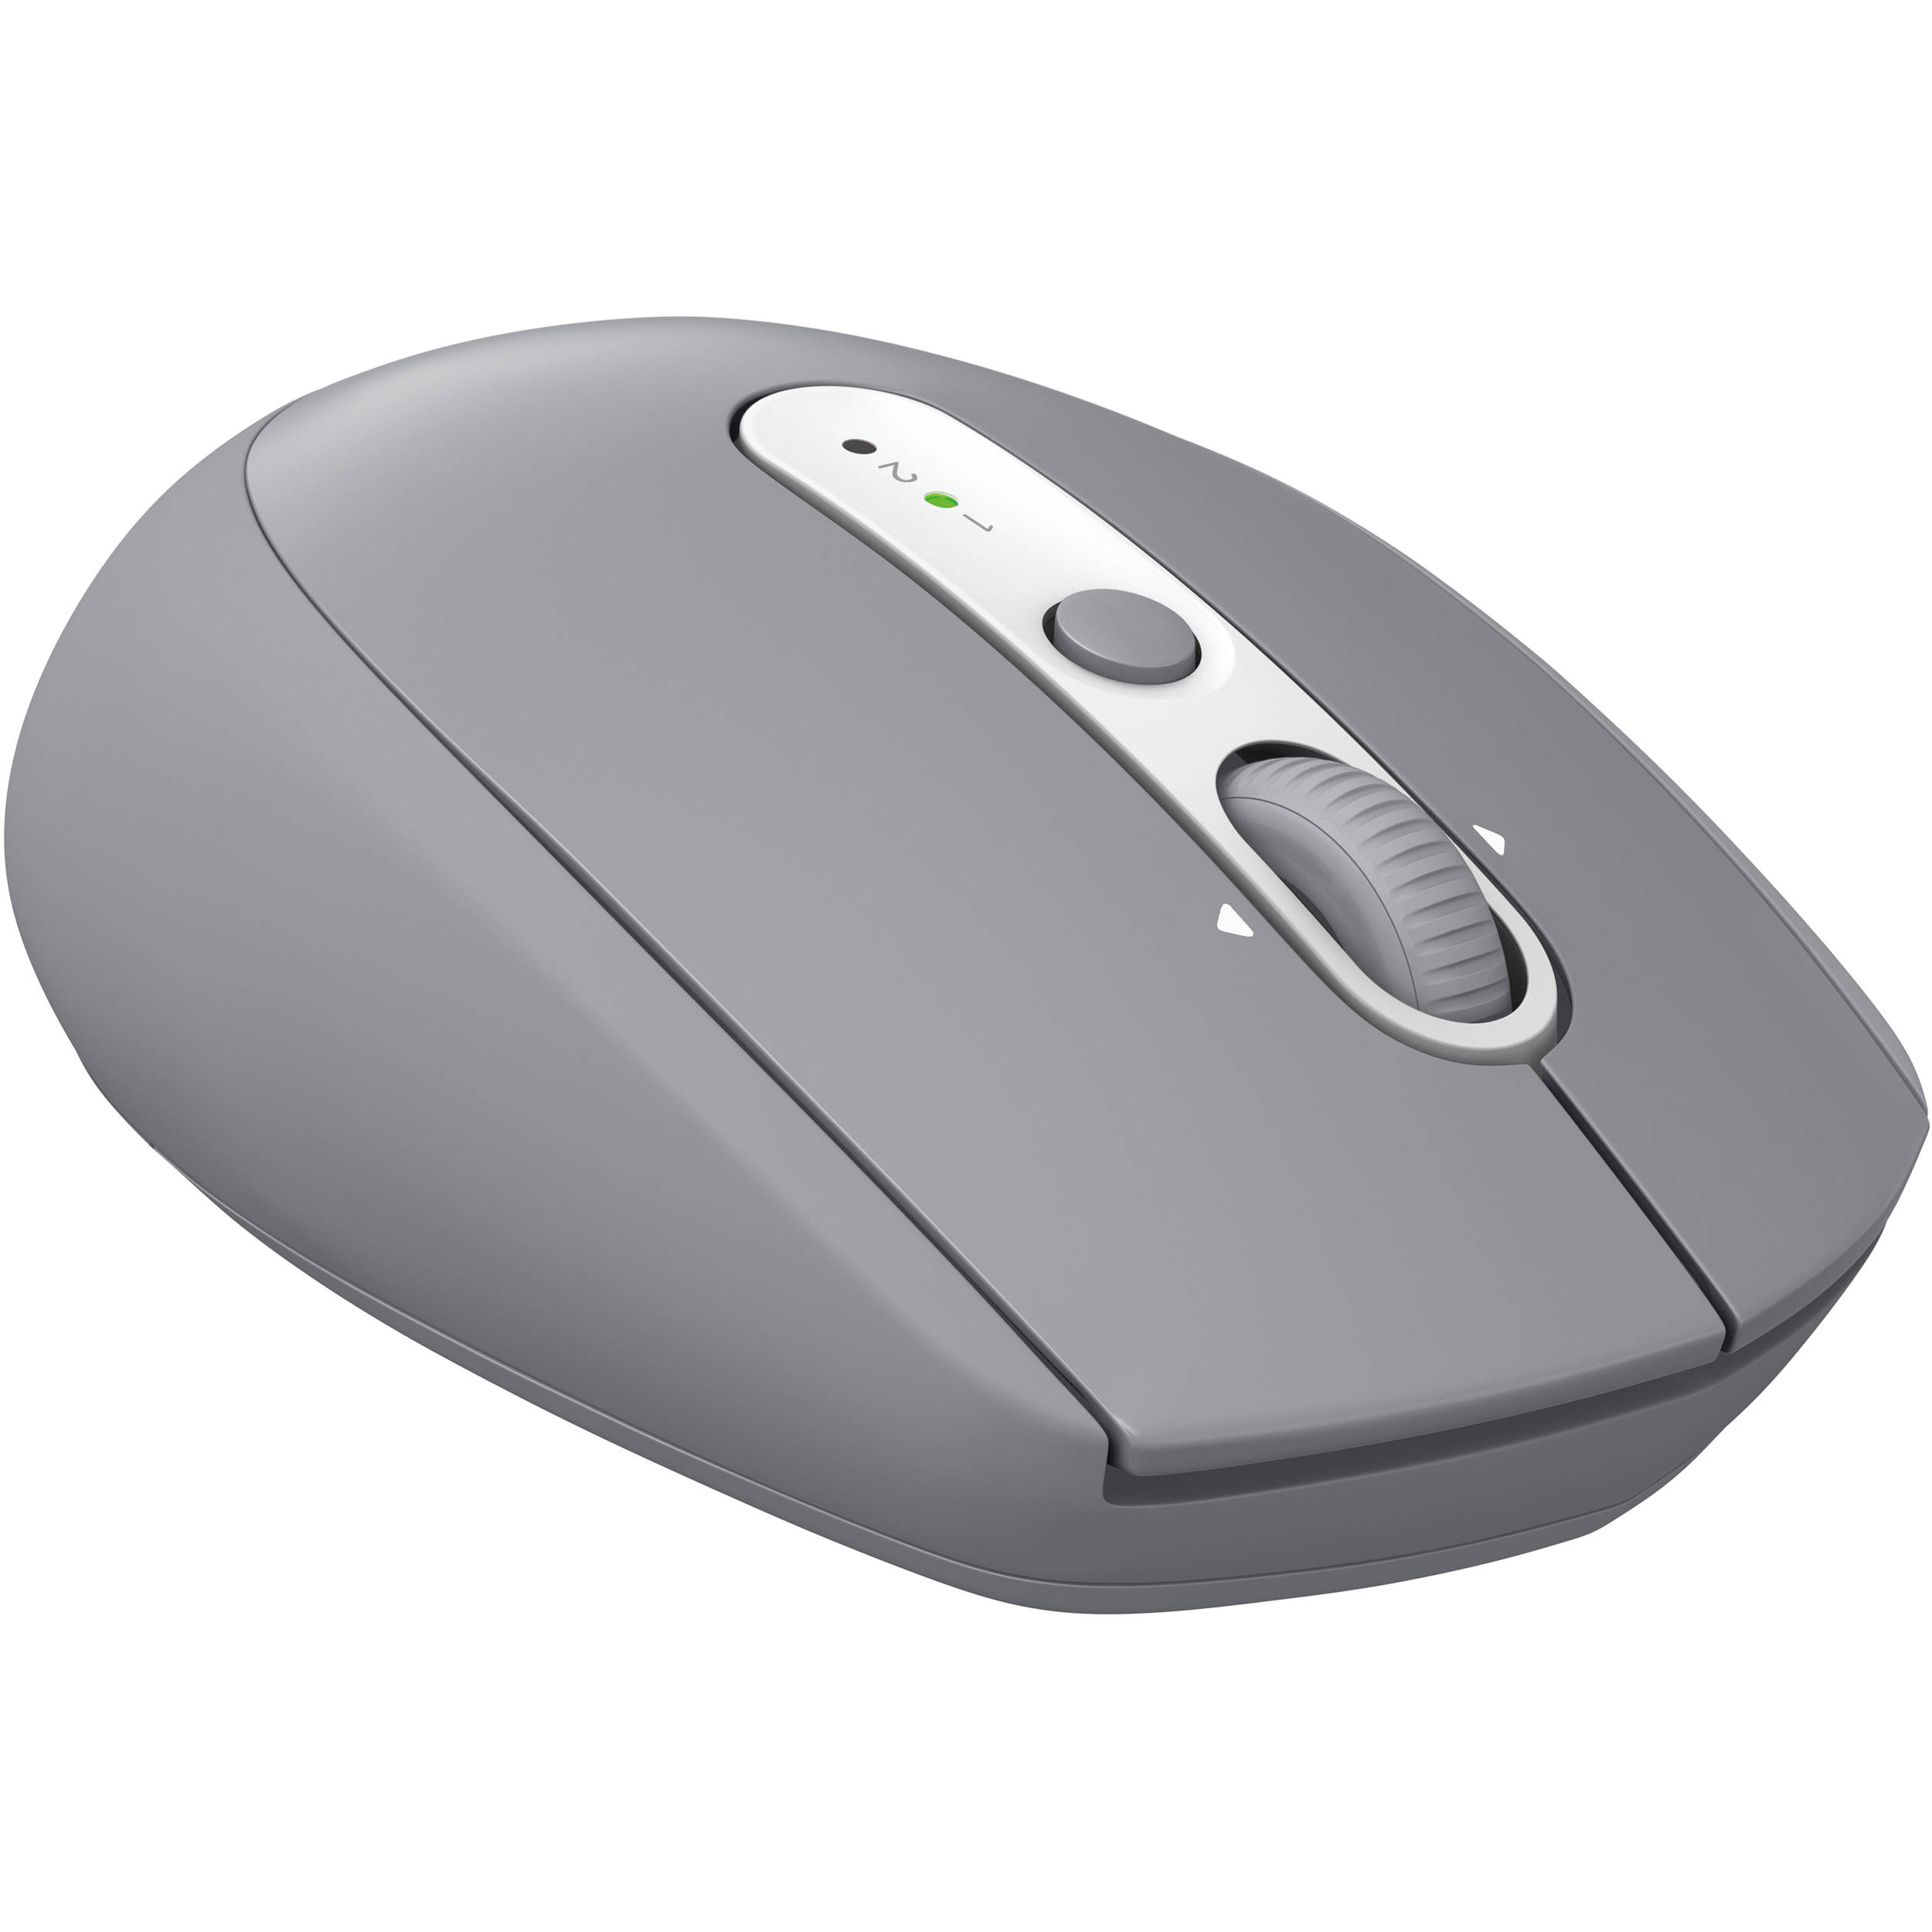 Logitech Multi-Device Wireless Mouse (Gray)